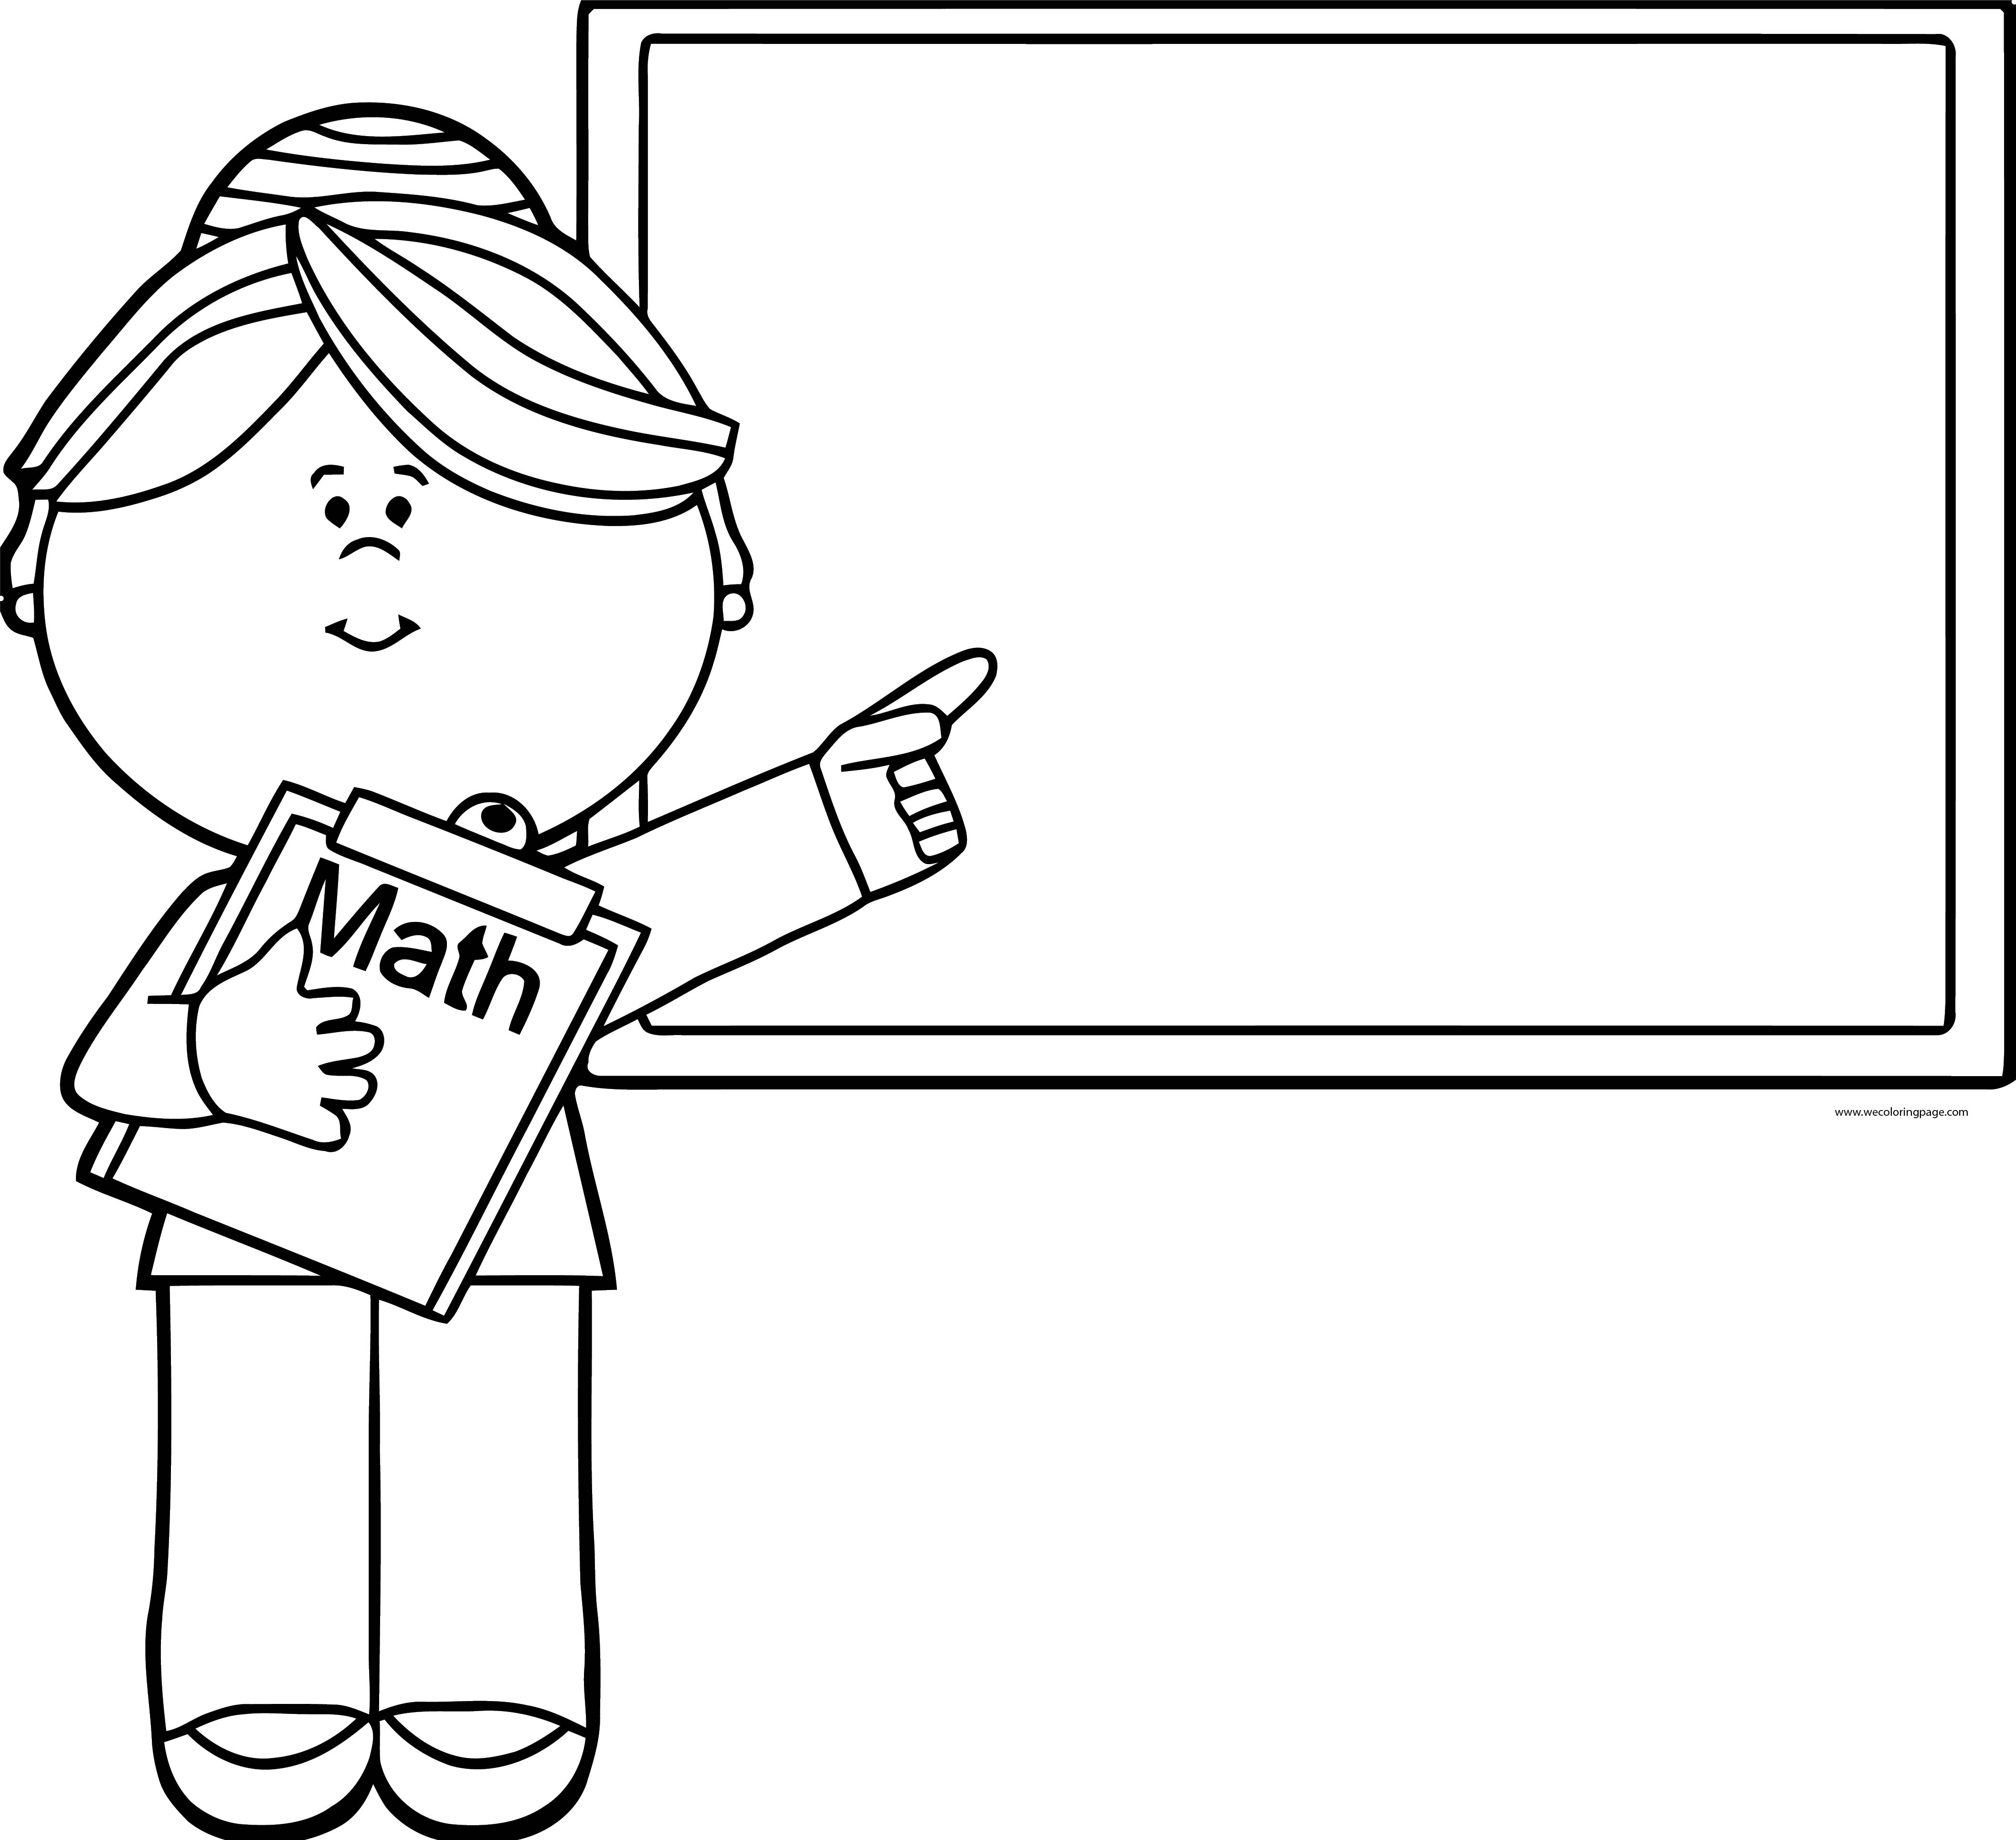 English Teacher Math Board Coloring Page